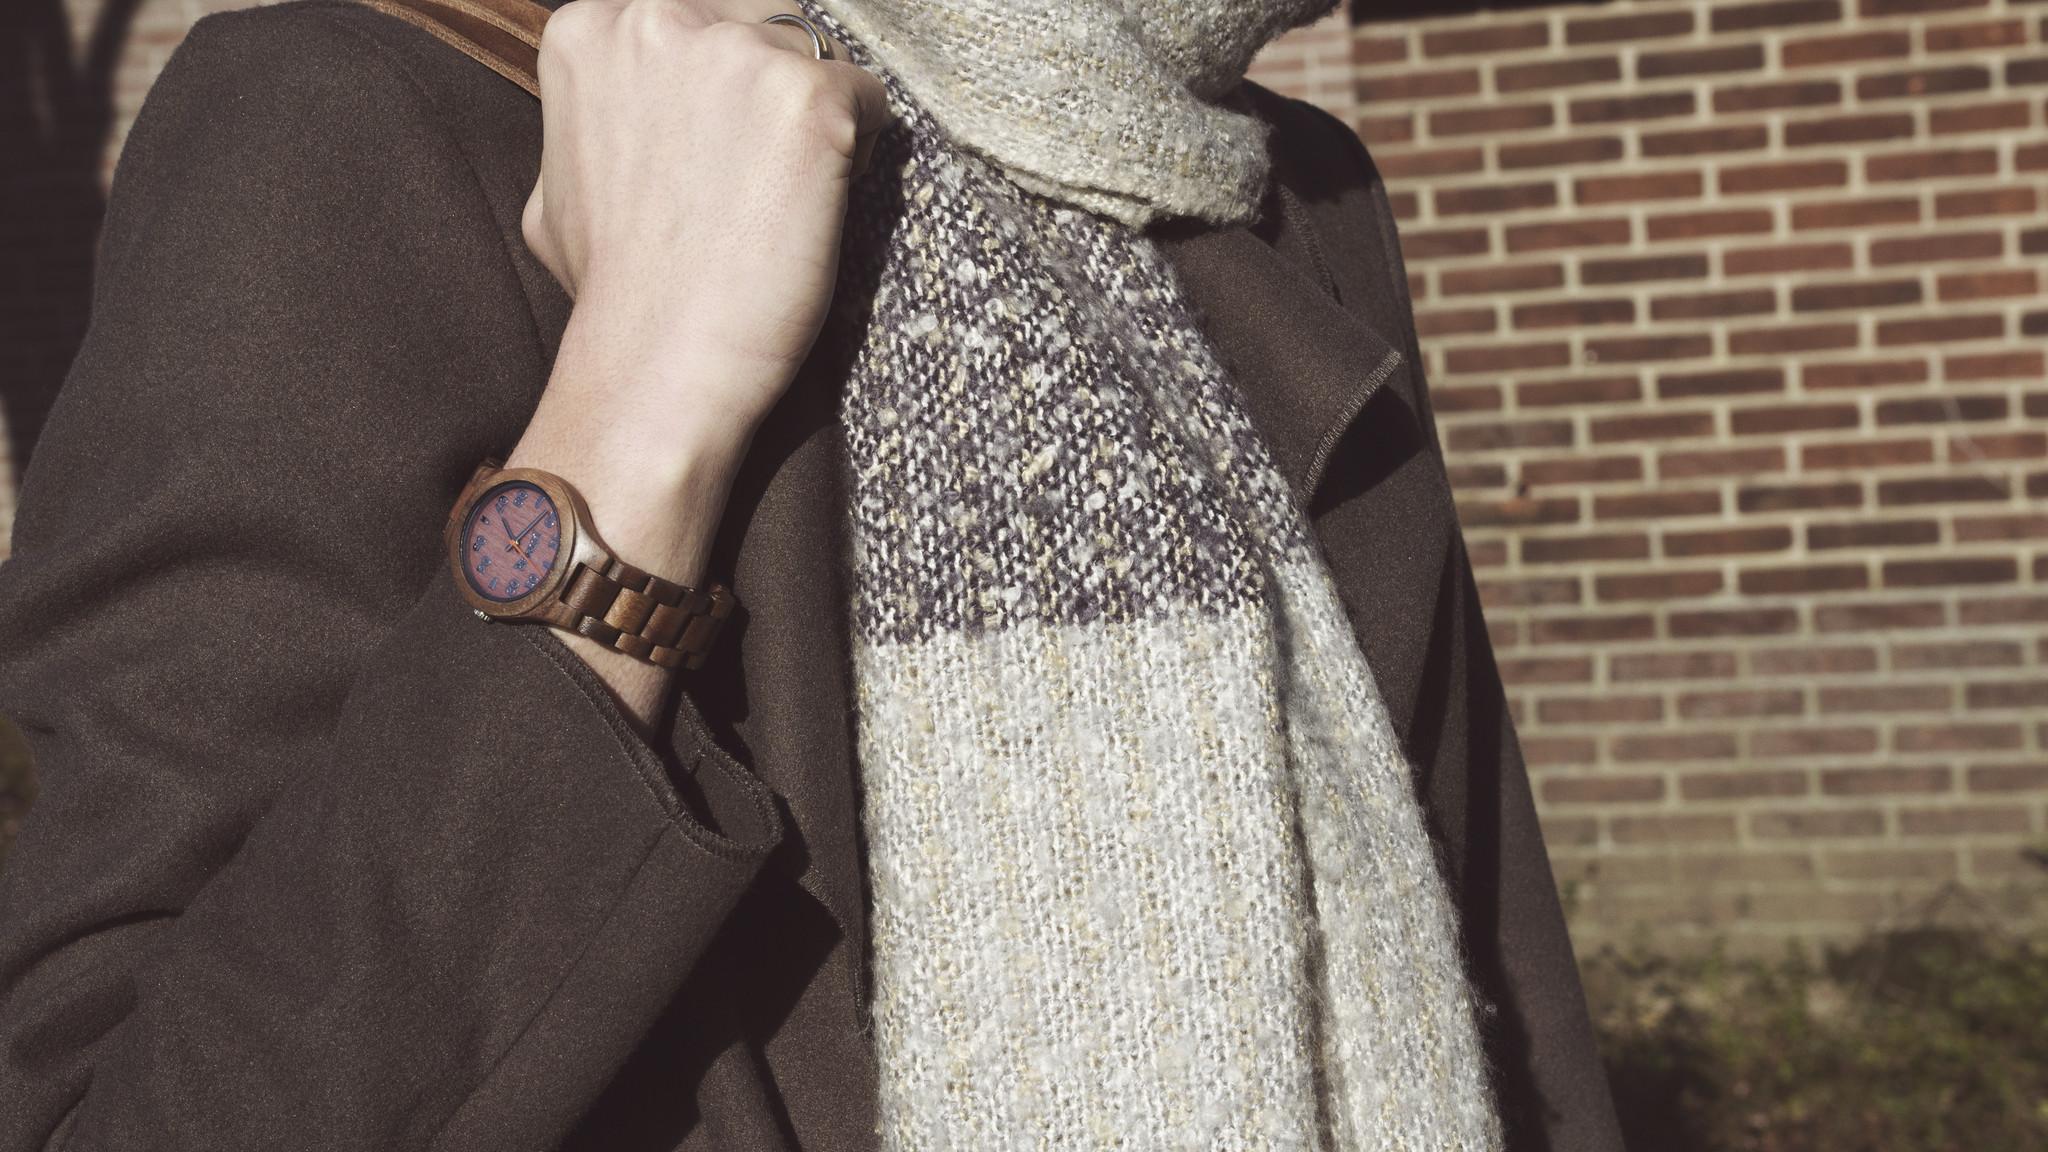 Houten accessoires make you shine: Een absolute must bij elke outfit